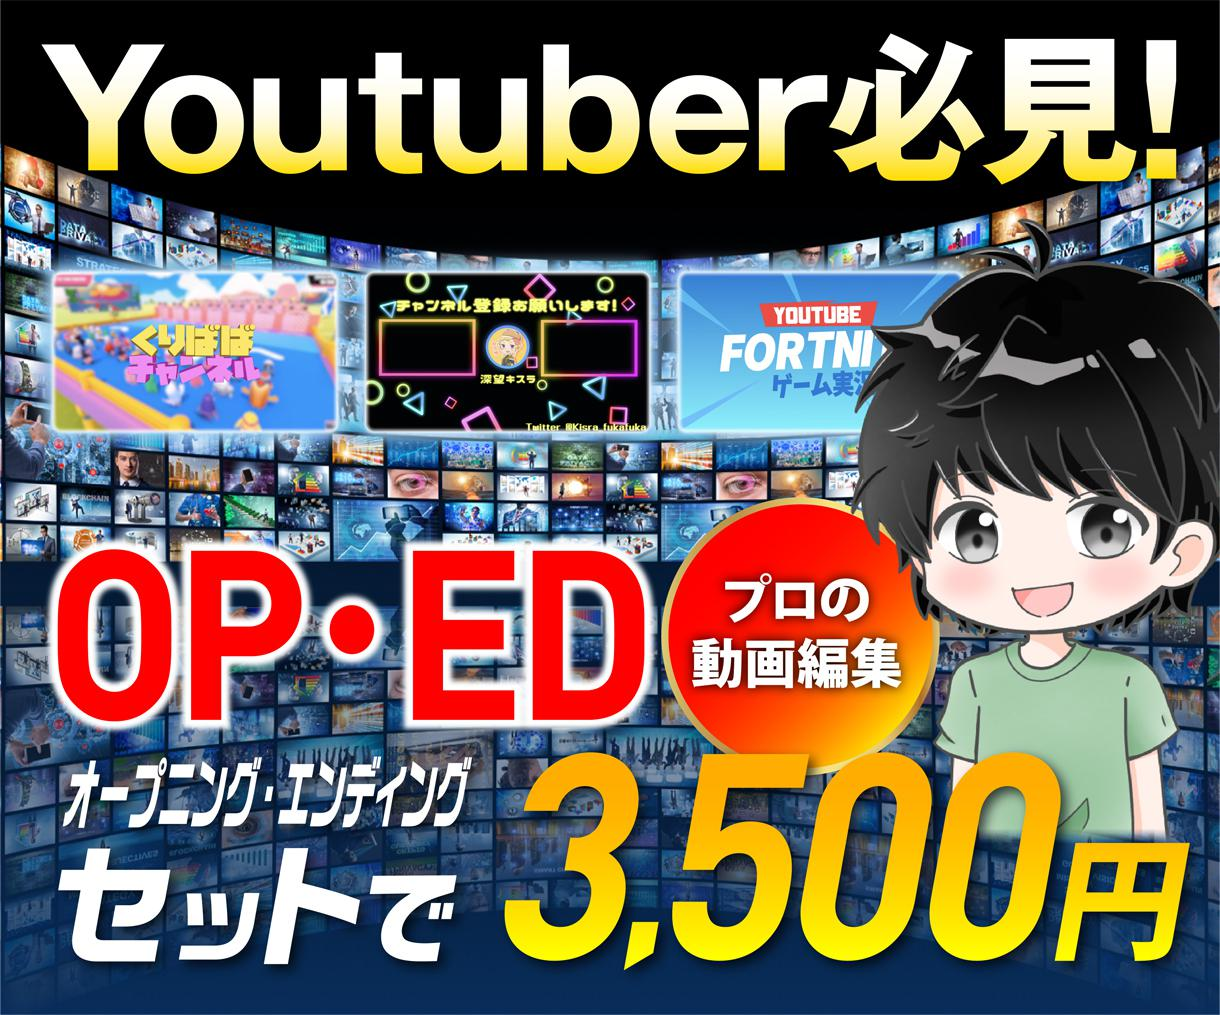 YoutubeのOPとEDセットを格安で制作します 登録者10万人ハイクオリティなYoutube編集担当者! イメージ1